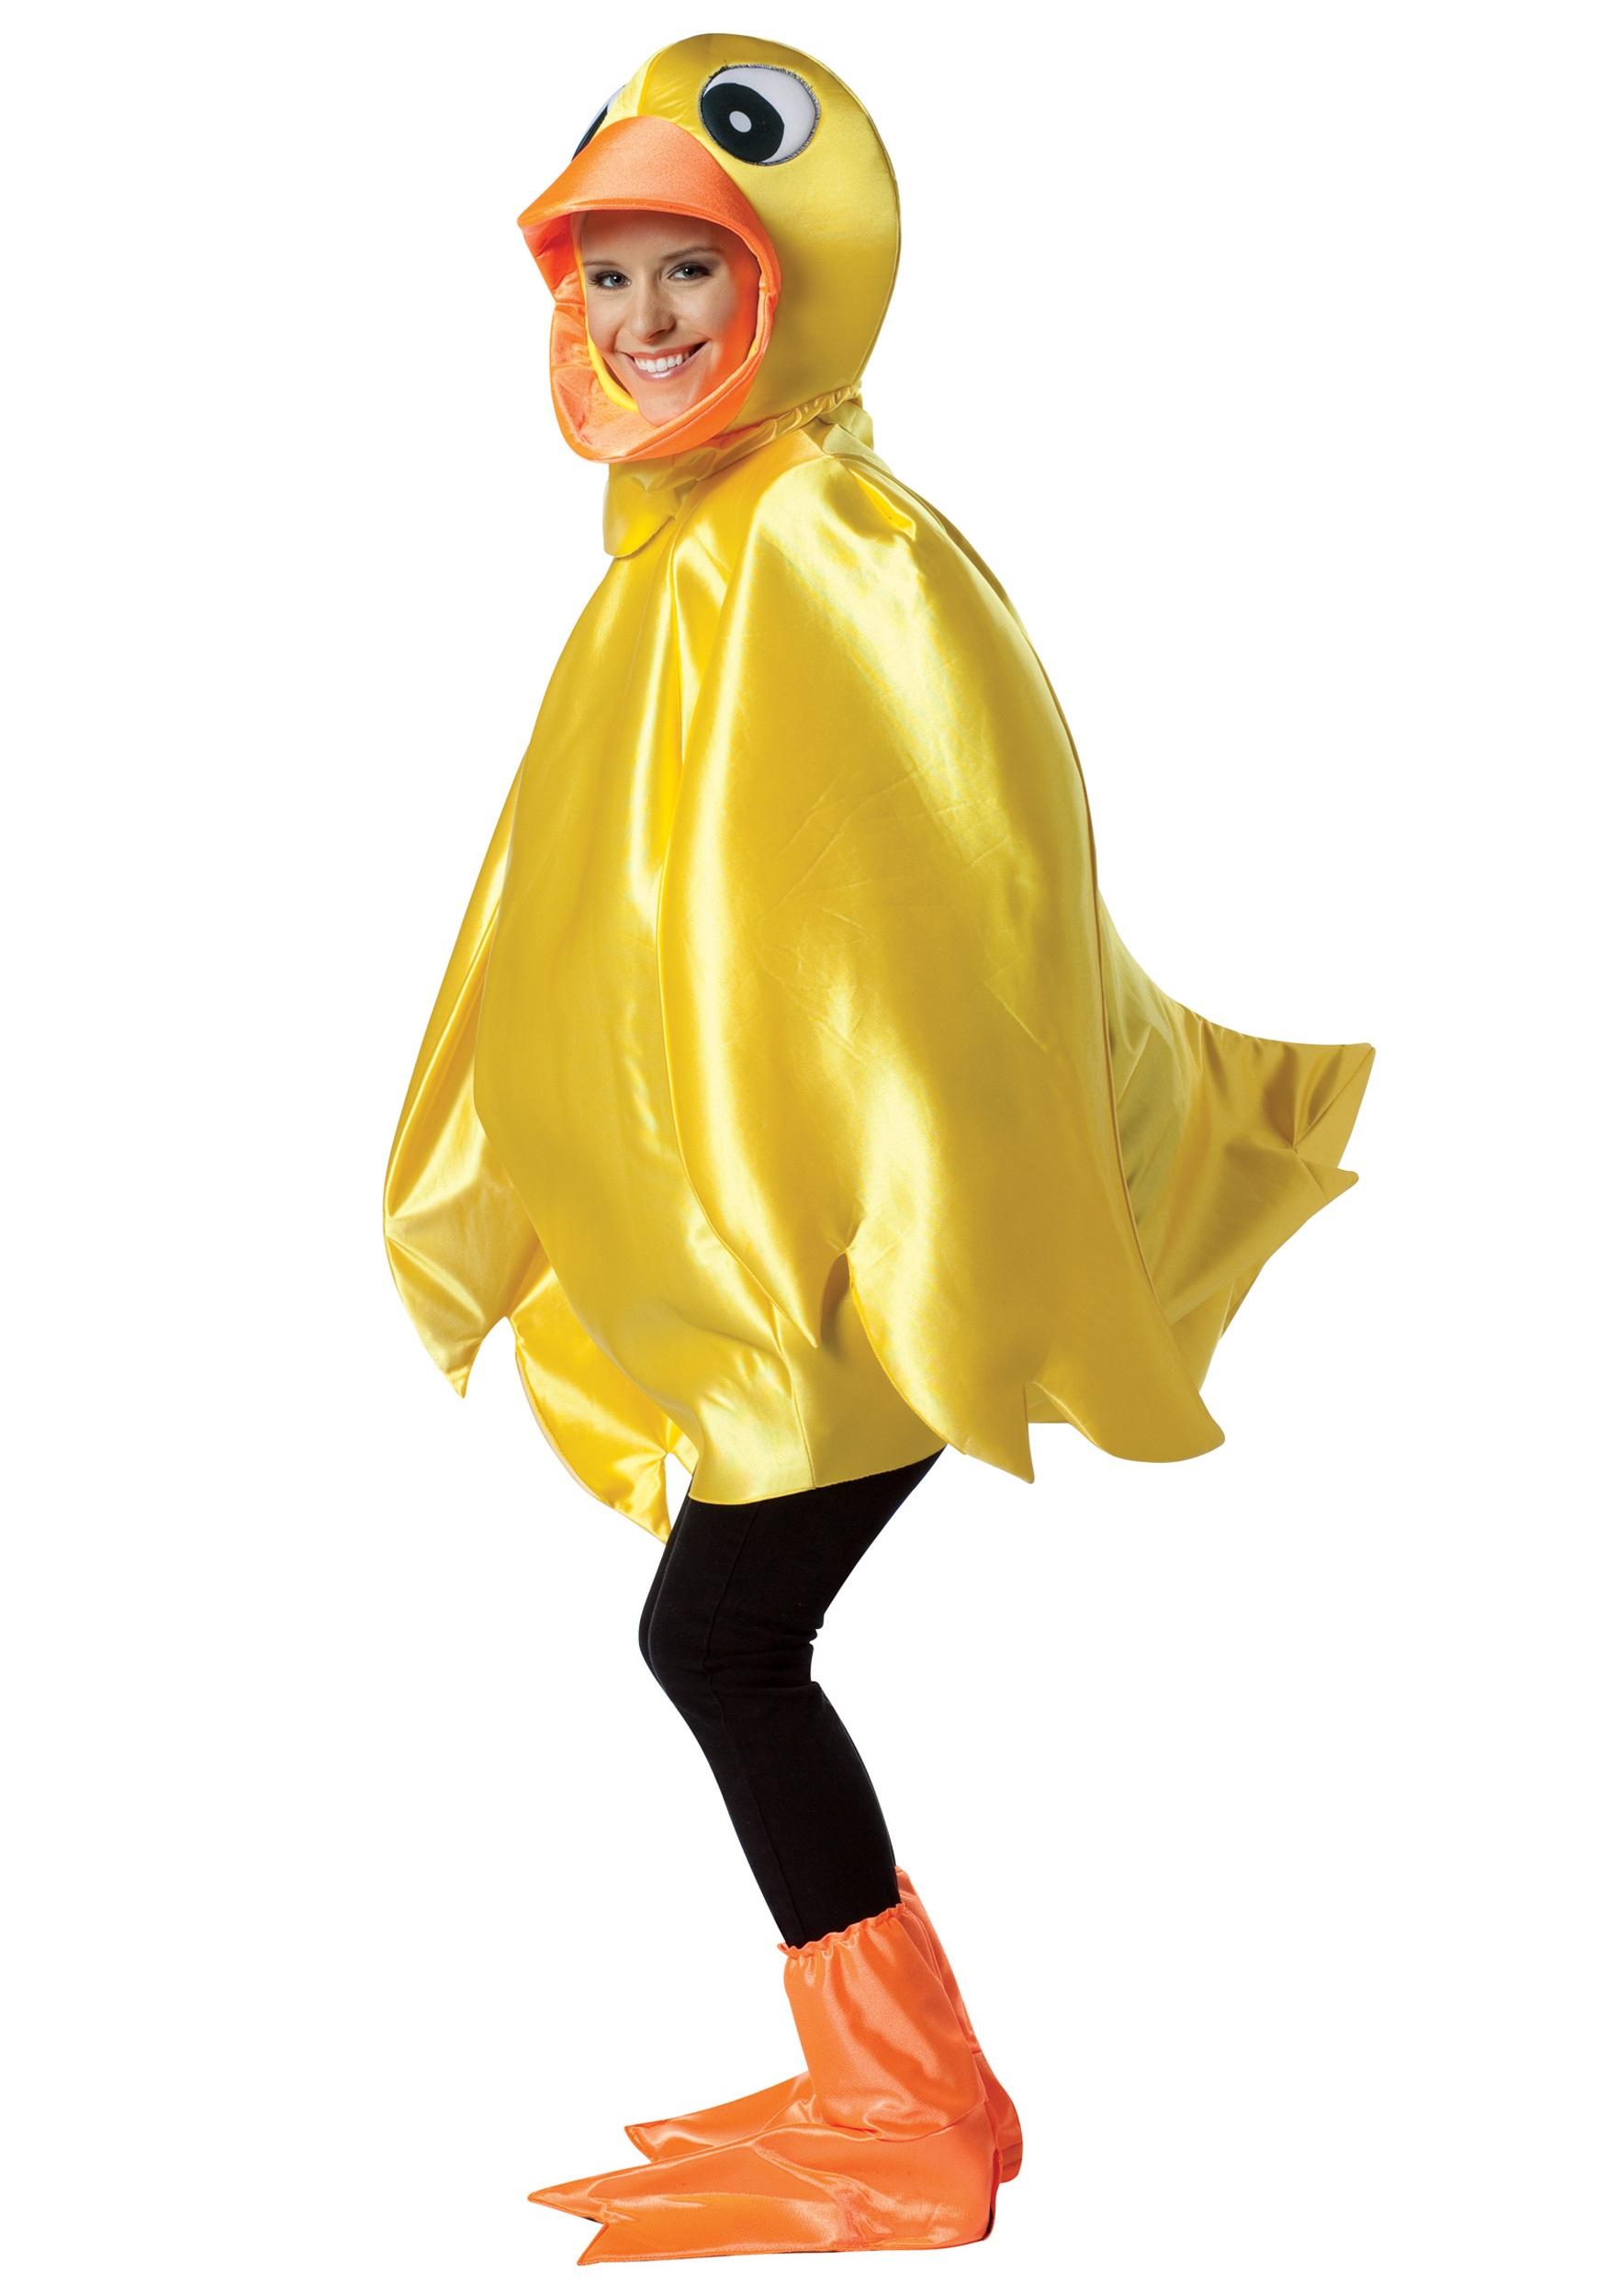 Adult Ducky Costume  sc 1 st  Halloween Costume & Adult Ducky Costume - Funny Animal Costumes